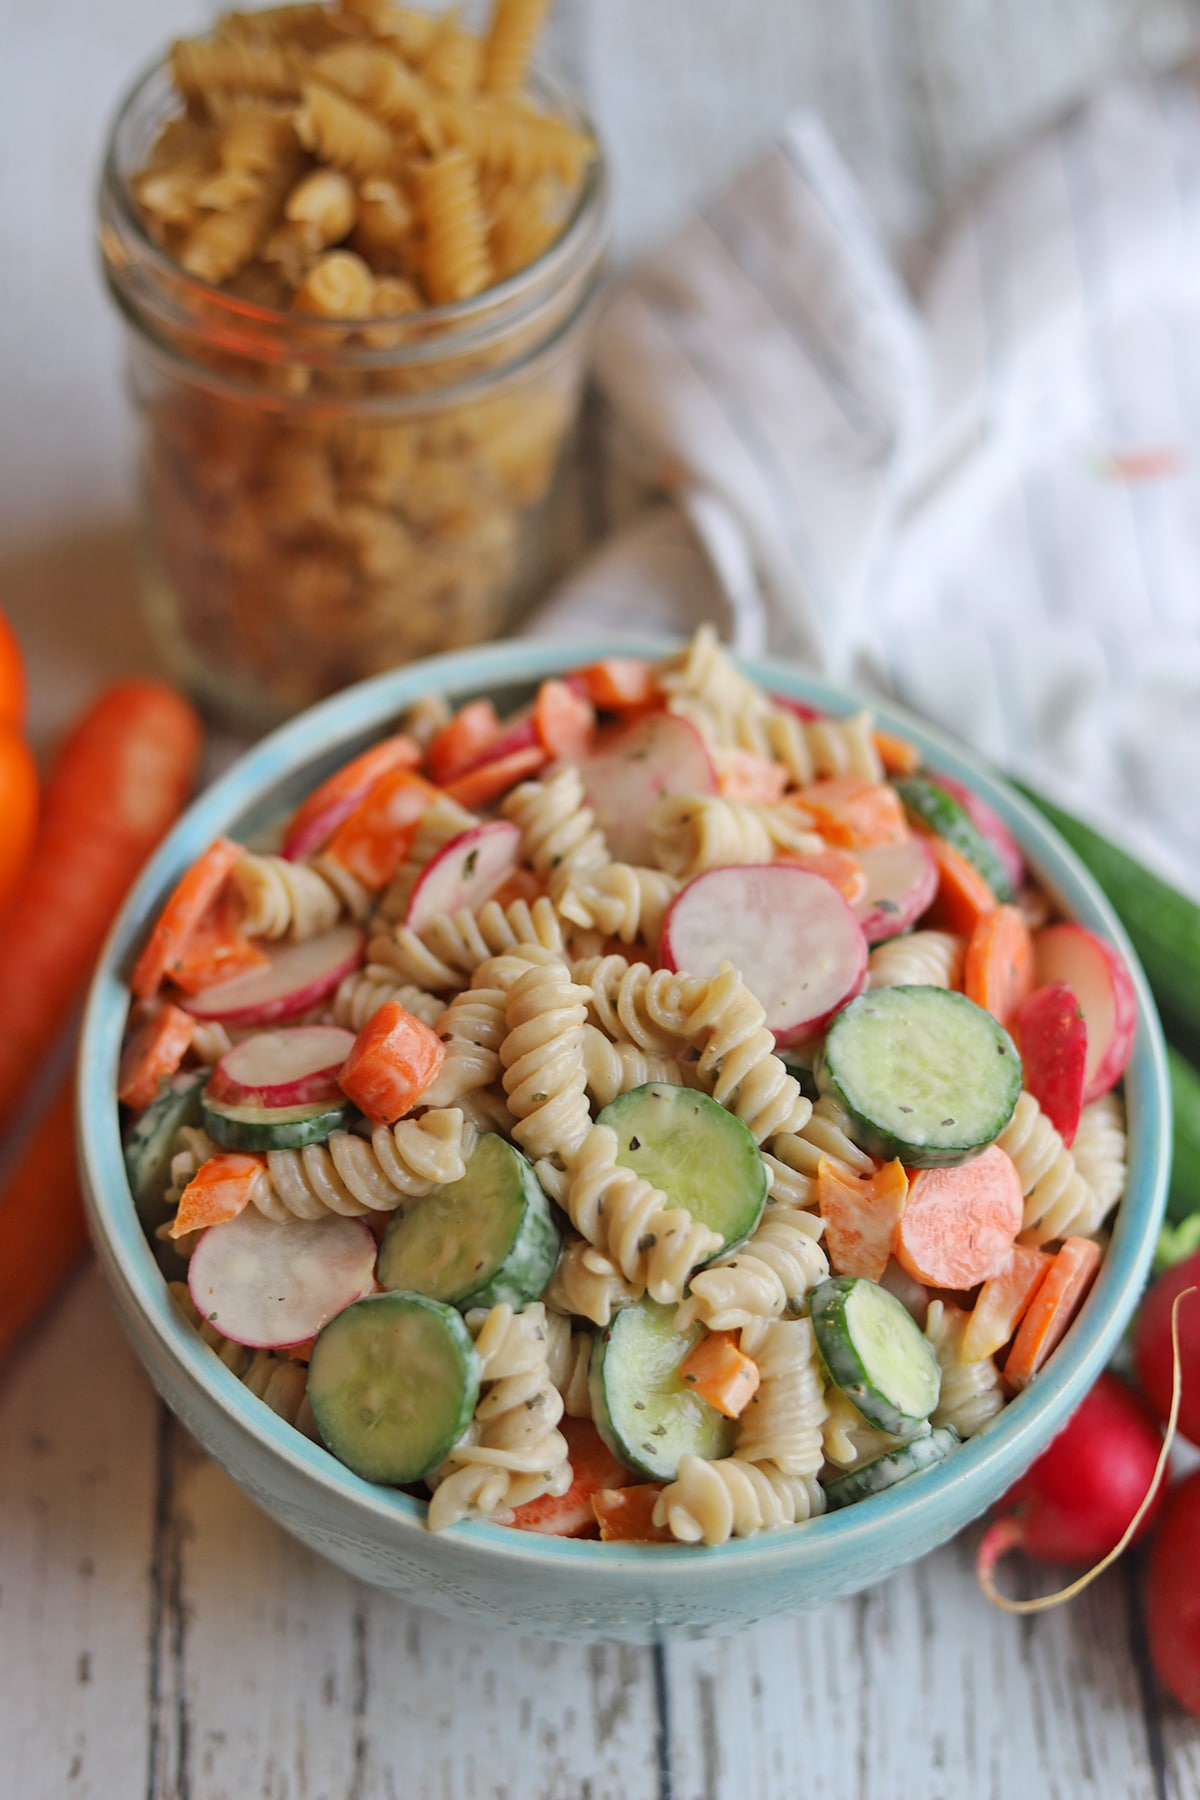 Vegan pasta salad in bowl on table.